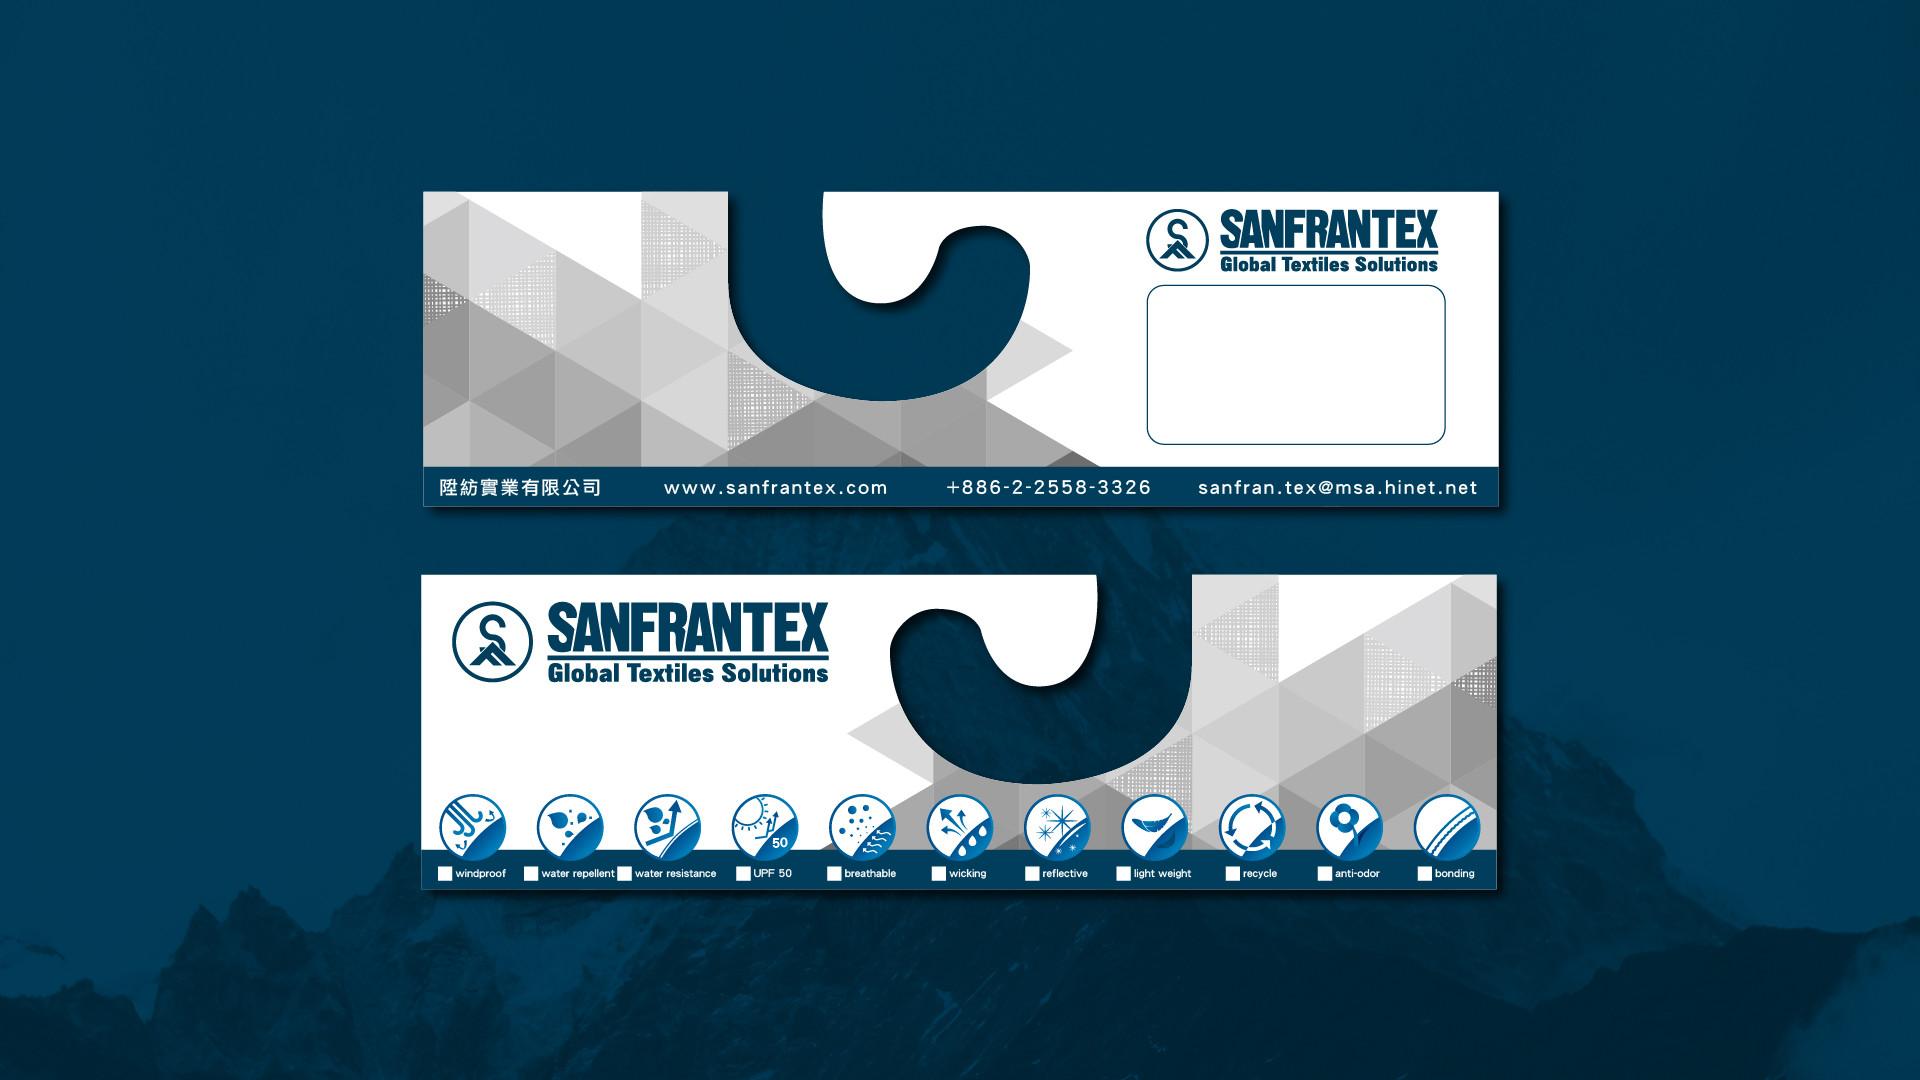 SF-Logo作品-16比9-1_工作區域 1 複本 3.jpg